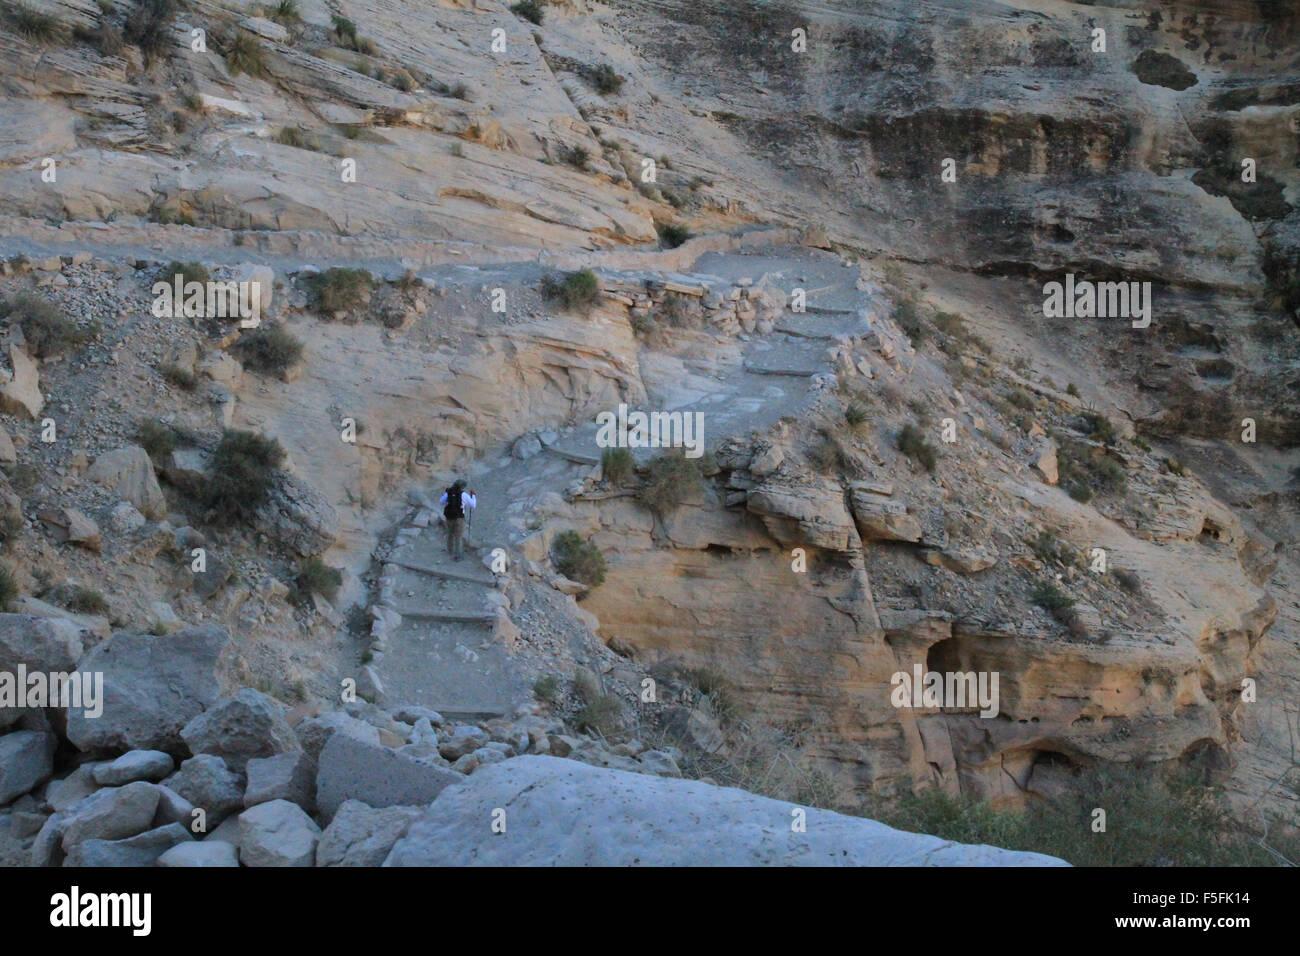 the switchbacks of the havasu falls hiking trail on the havasupai